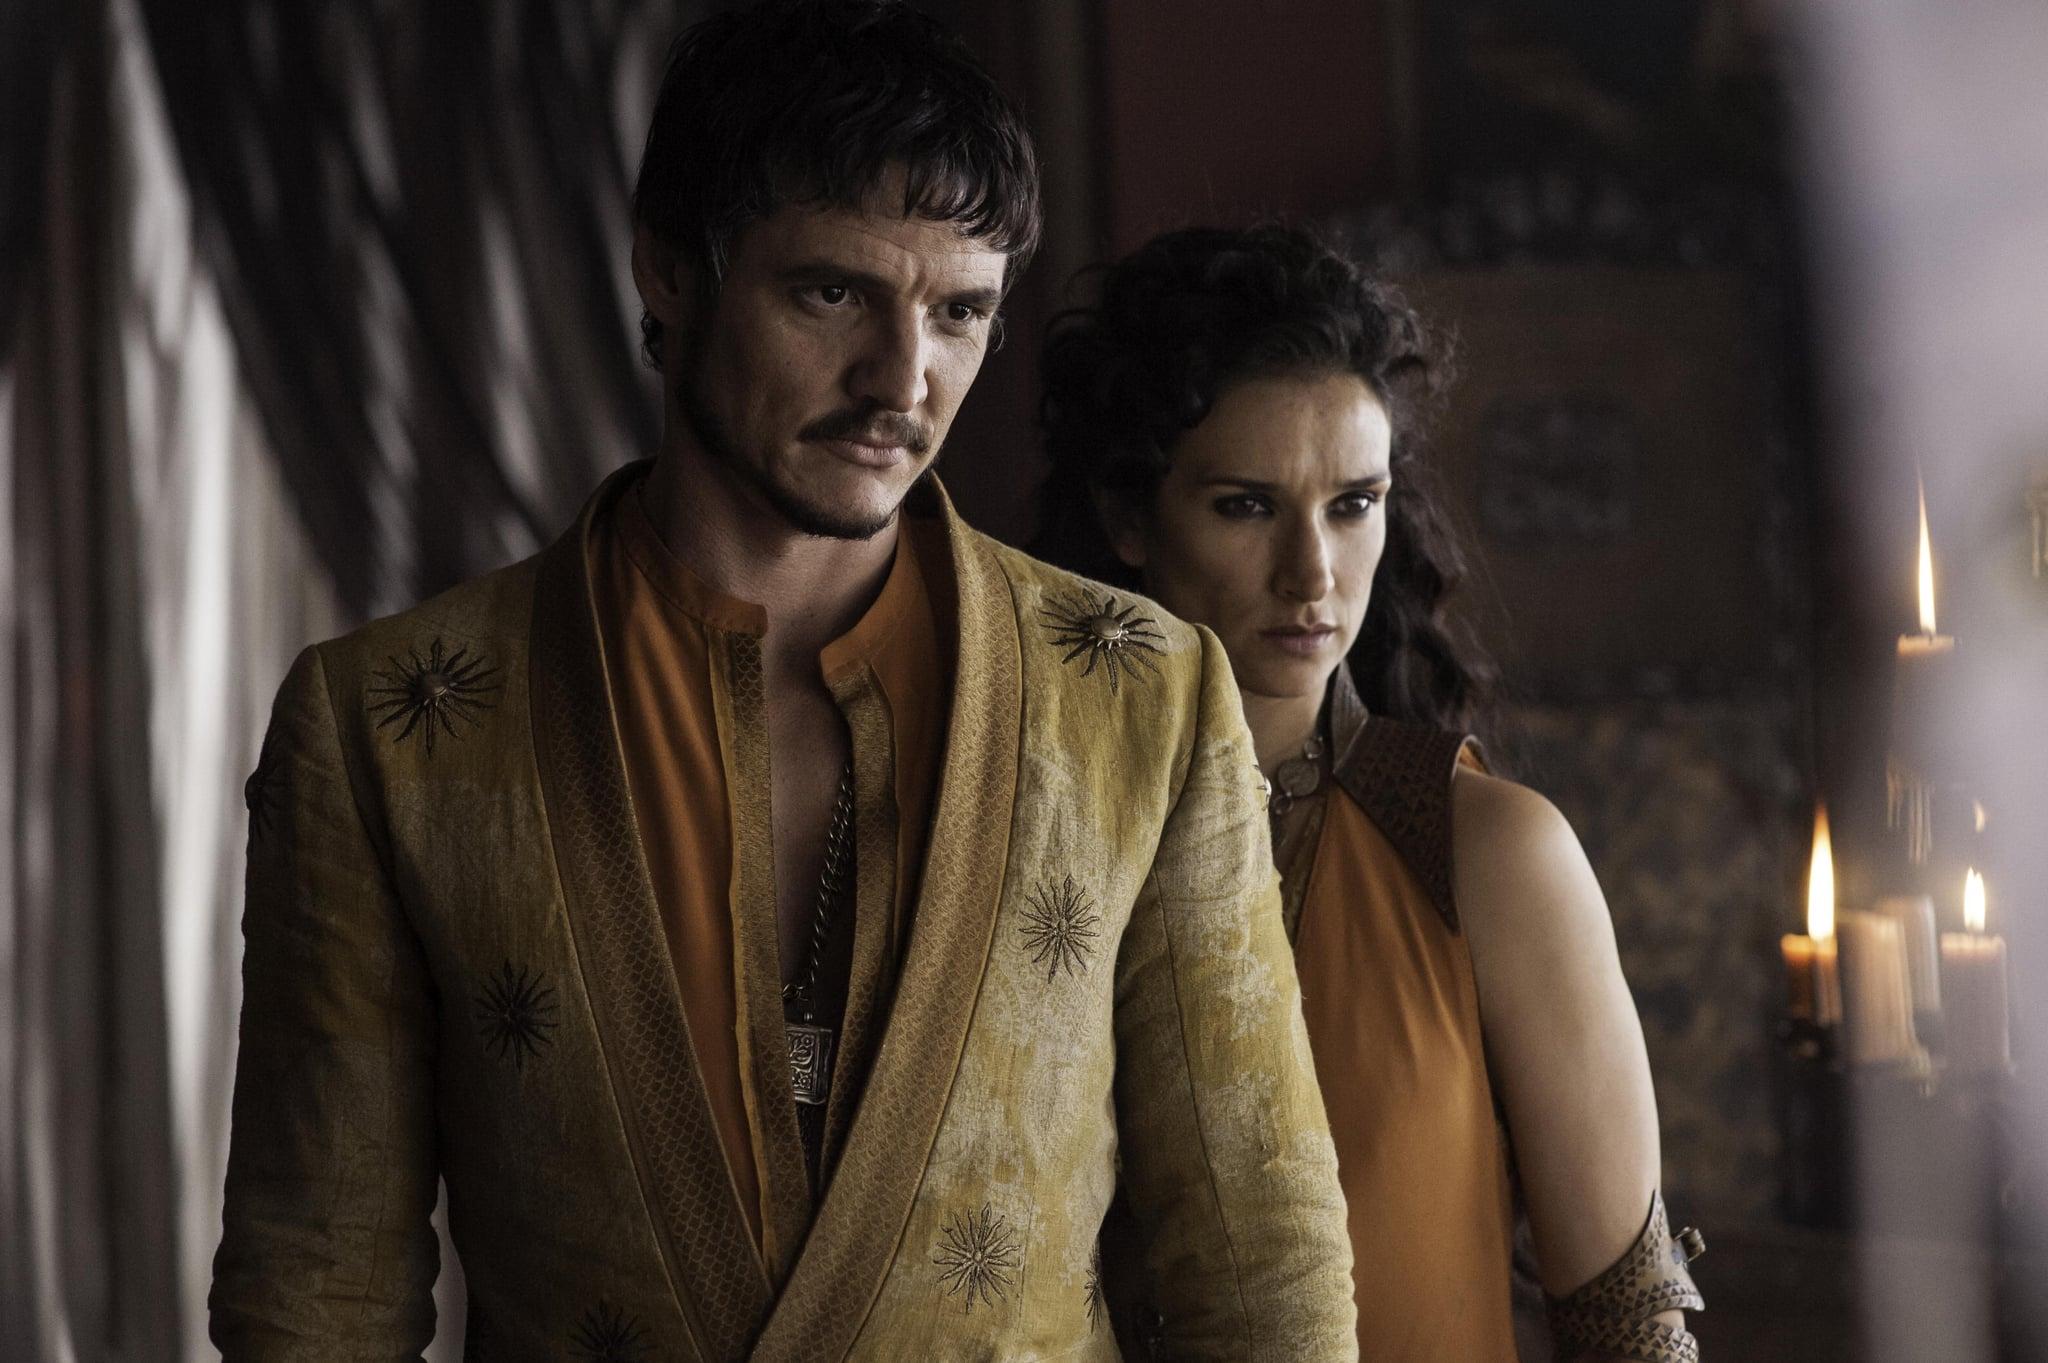 Pedro Pascal as Oberyn Martell and Indira Varma as Ellaria Sand.